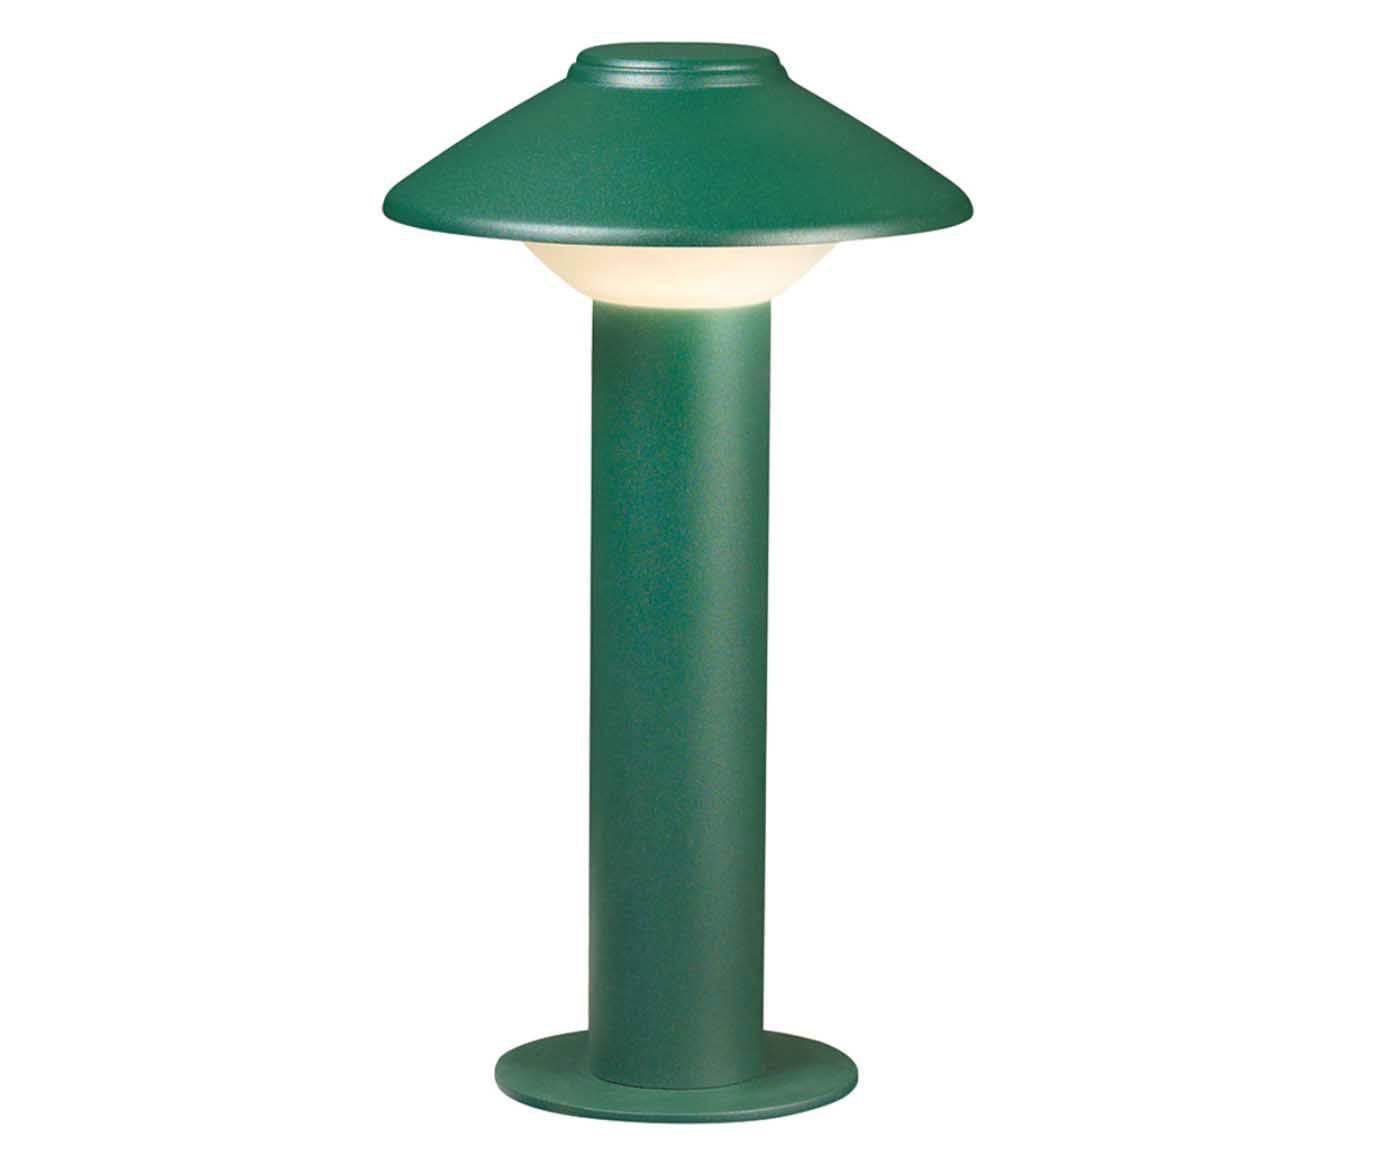 Poste de jardim bangkok - la lampe | Westwing.com.br